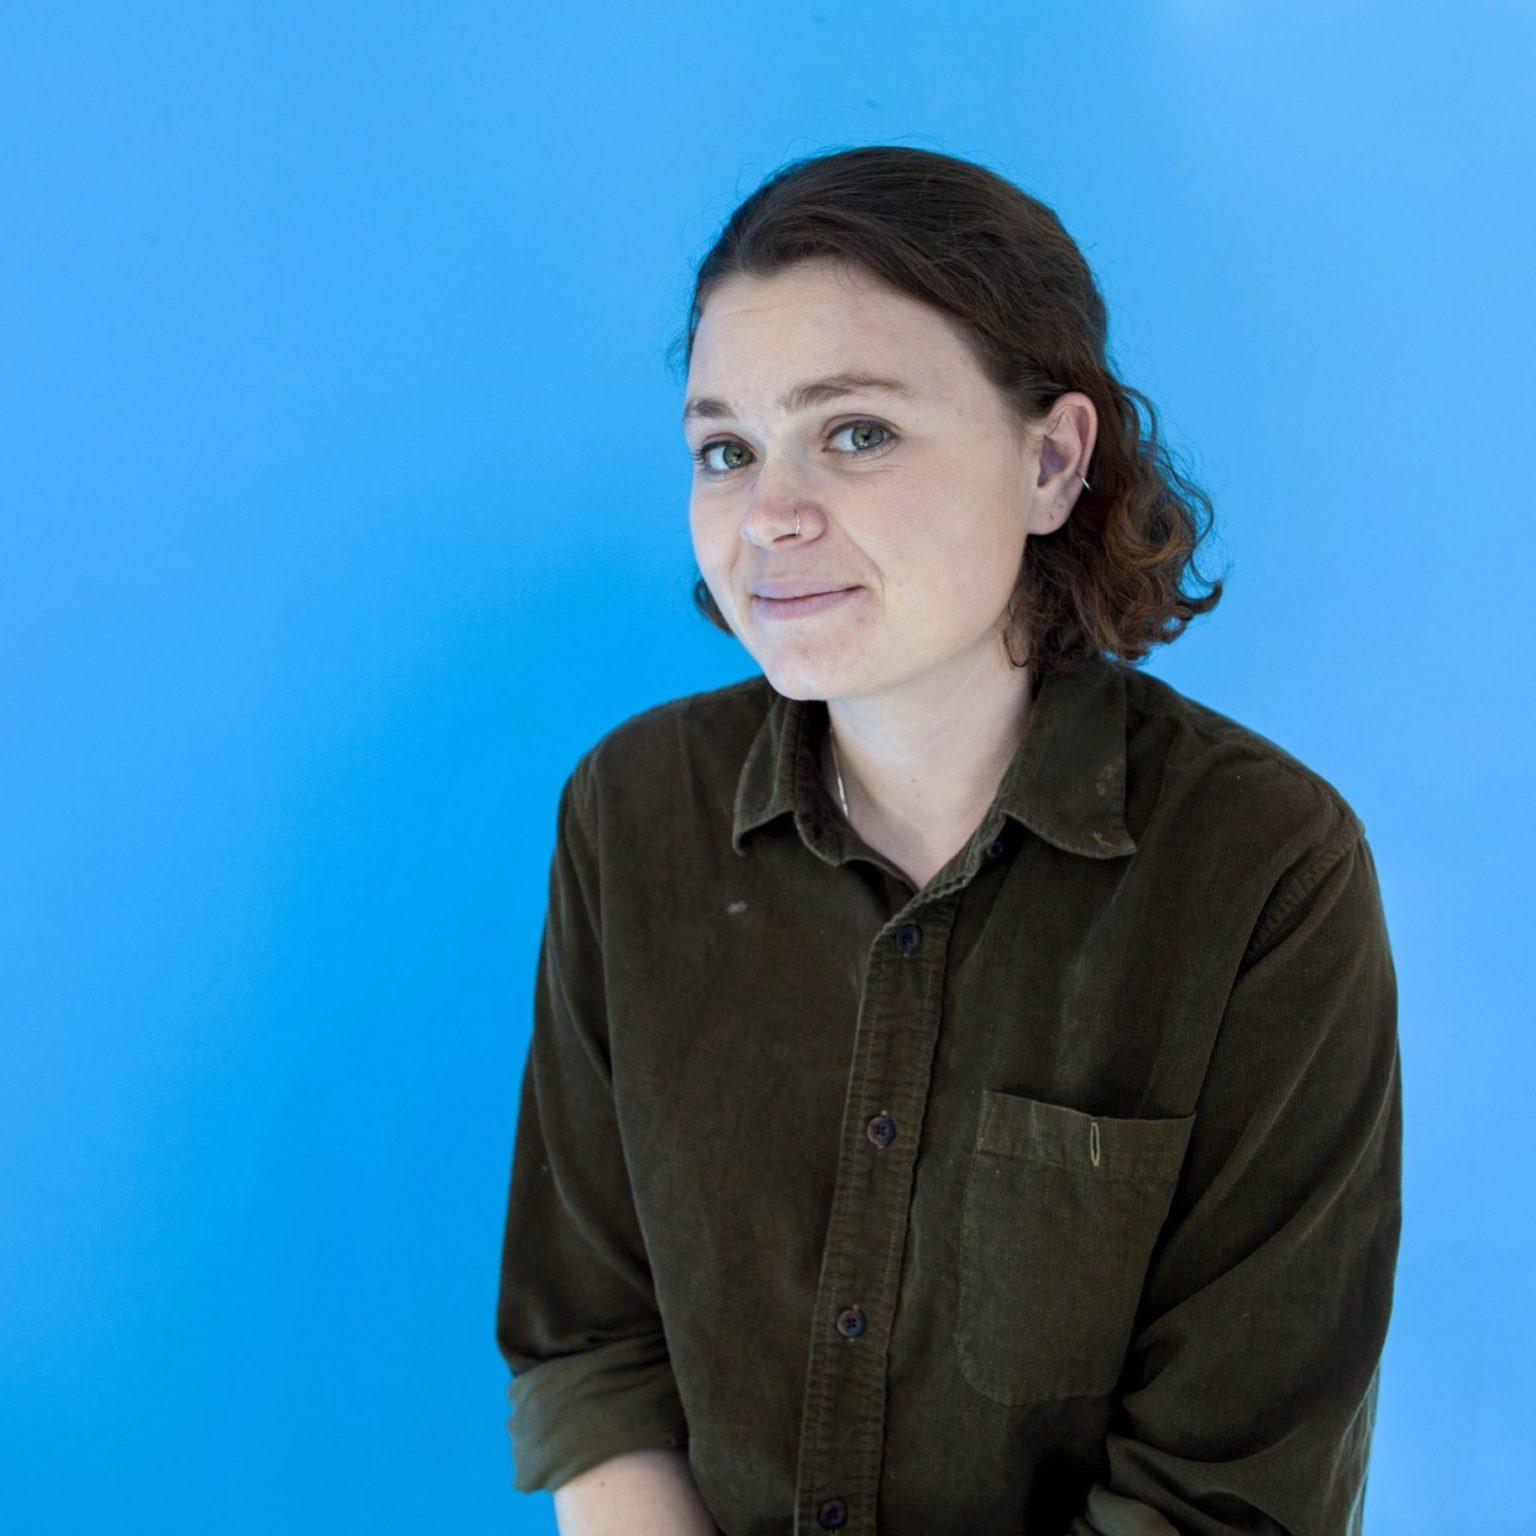 Greta Jochem